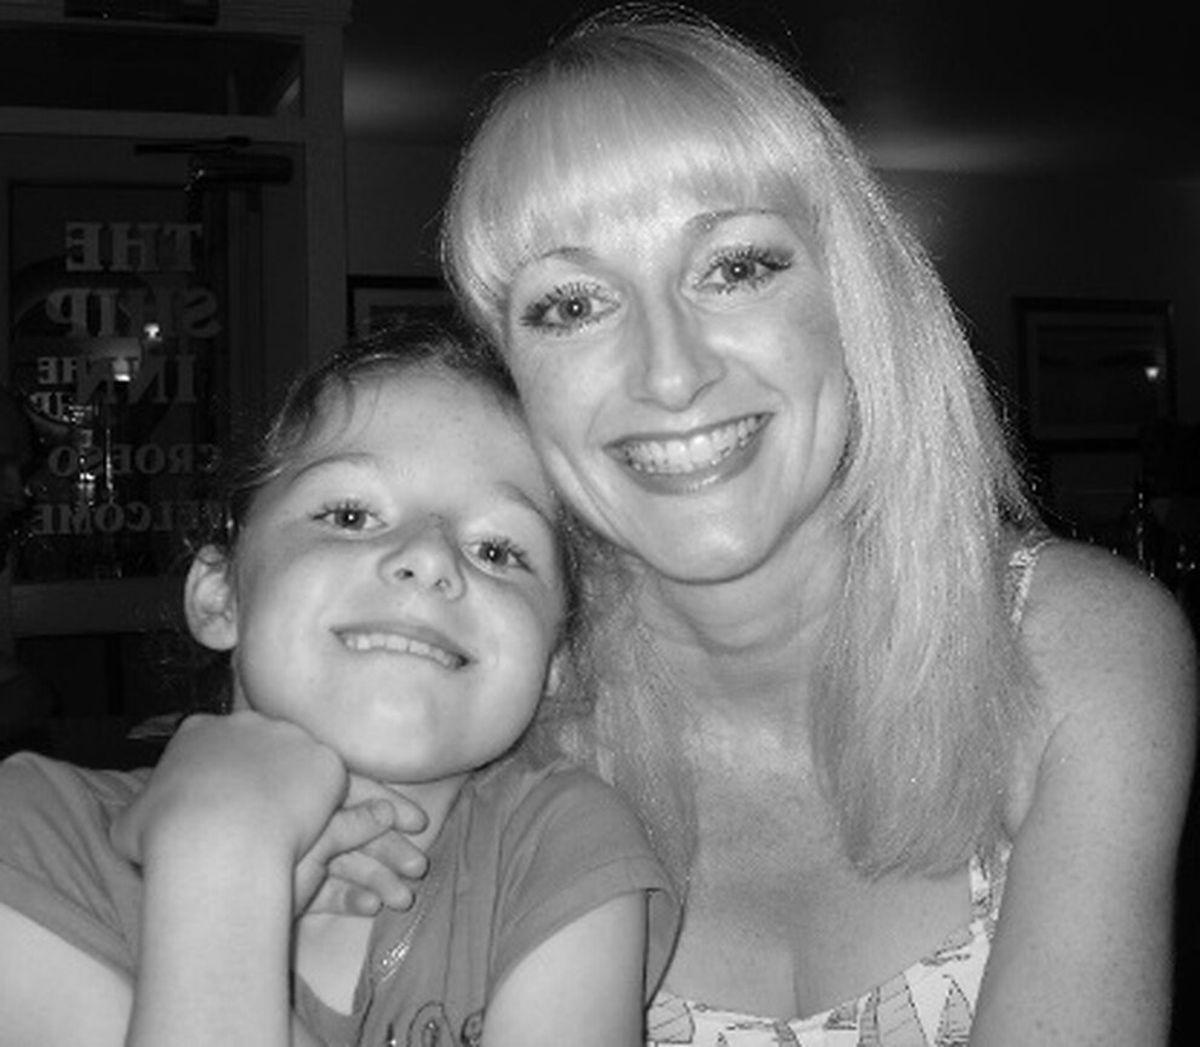 Cheryl Hooper and her daughter Georgia